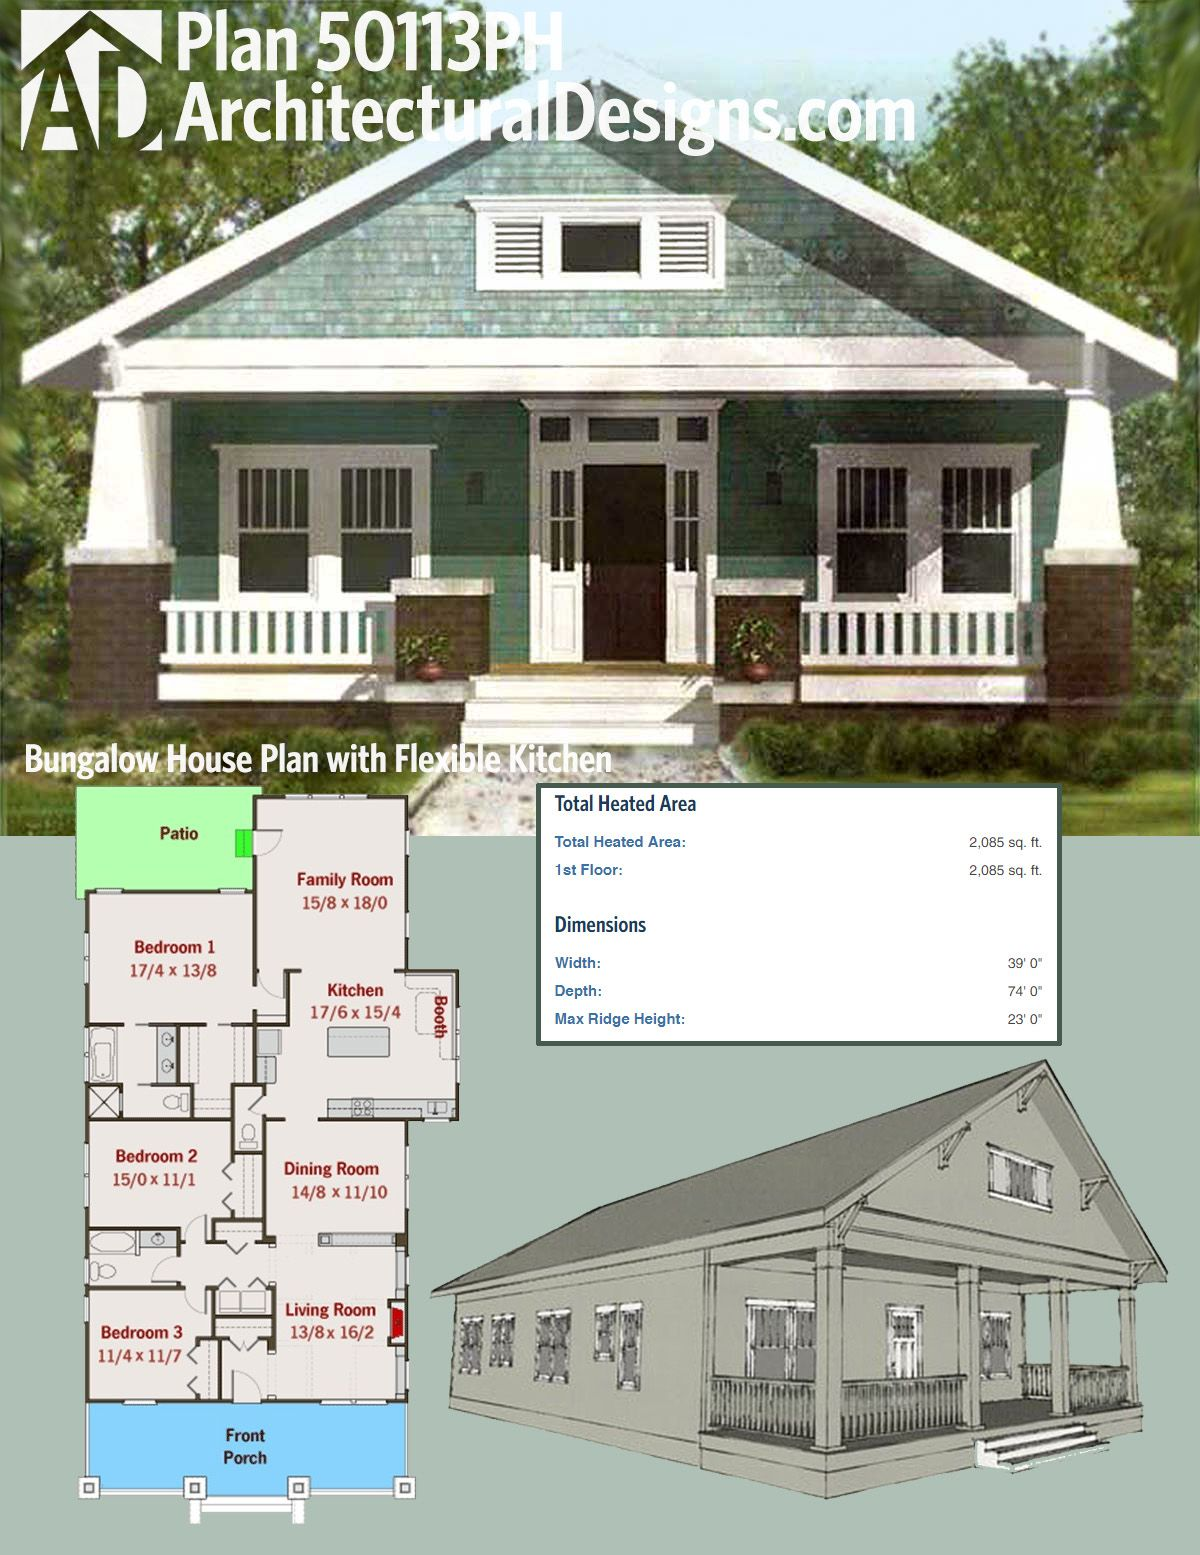 plan 50113ph bungalow house plan with flexible kitchen bungalow